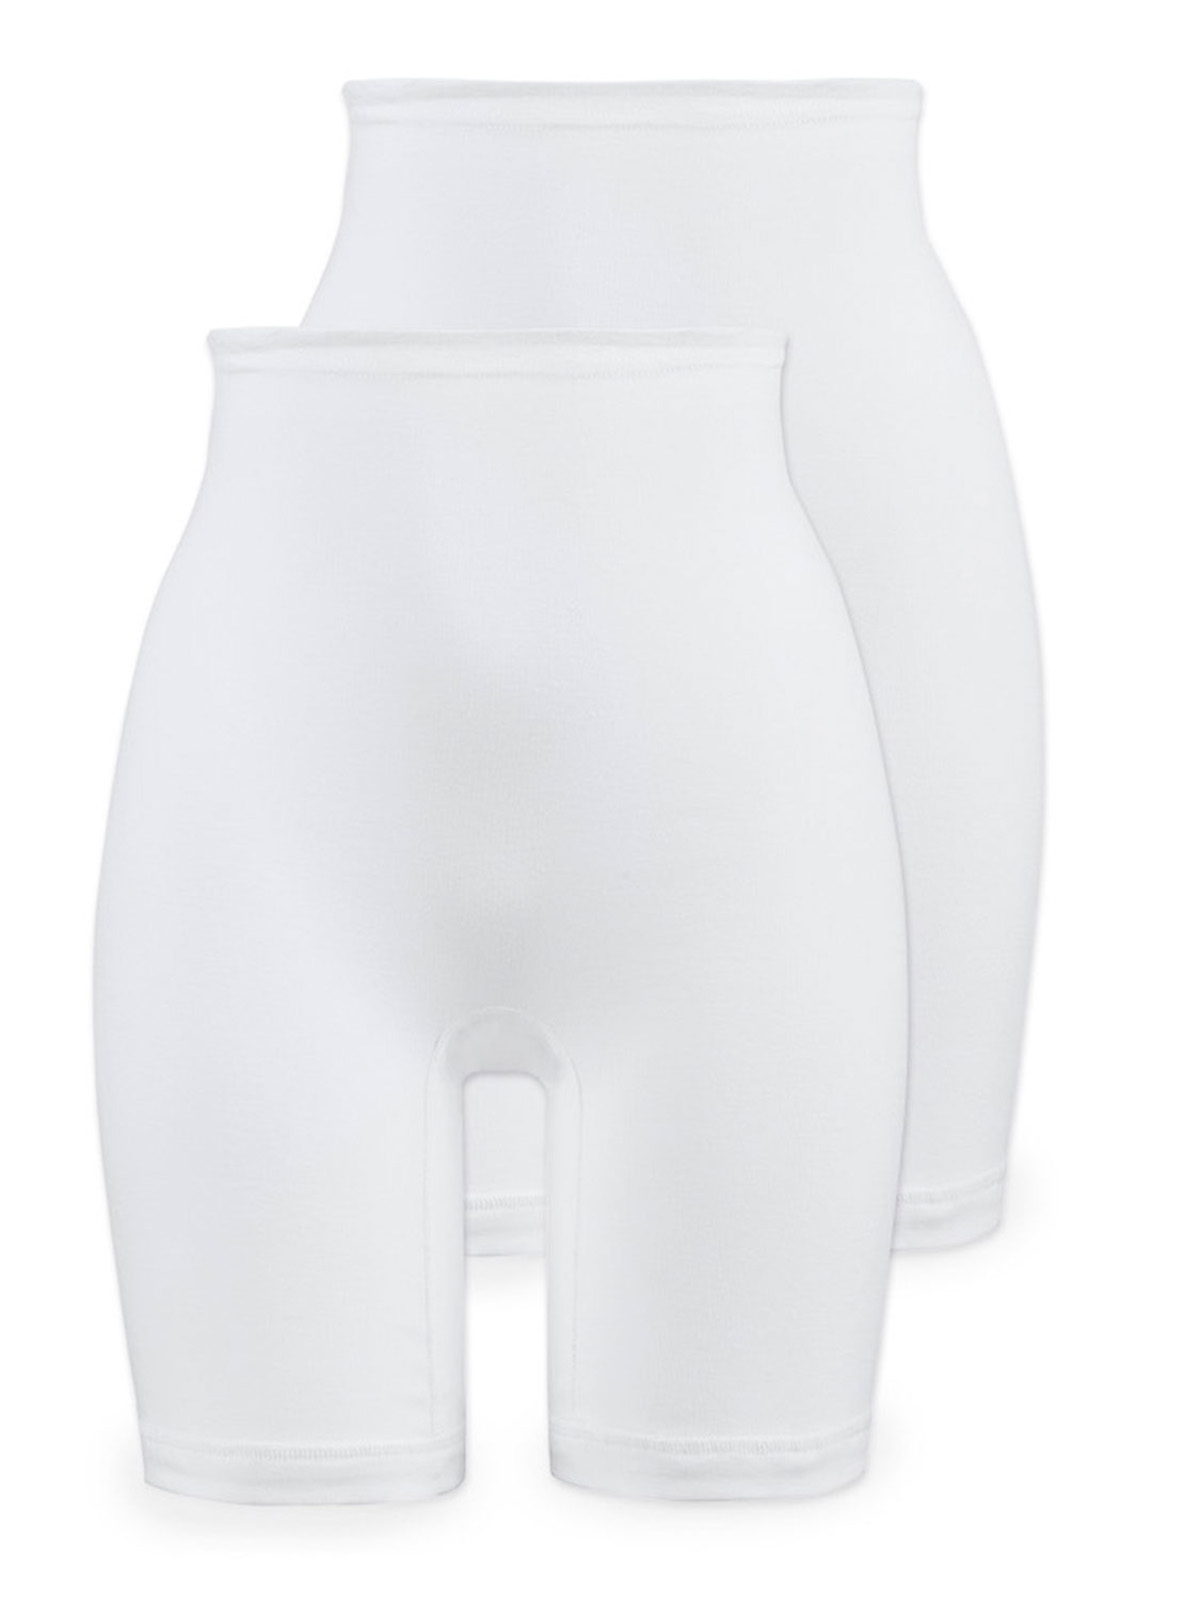 4er Pack Damen Pagenschlüpfer Panty aus Baumwolle 2201 Naturana Gr 40-54 Weiss